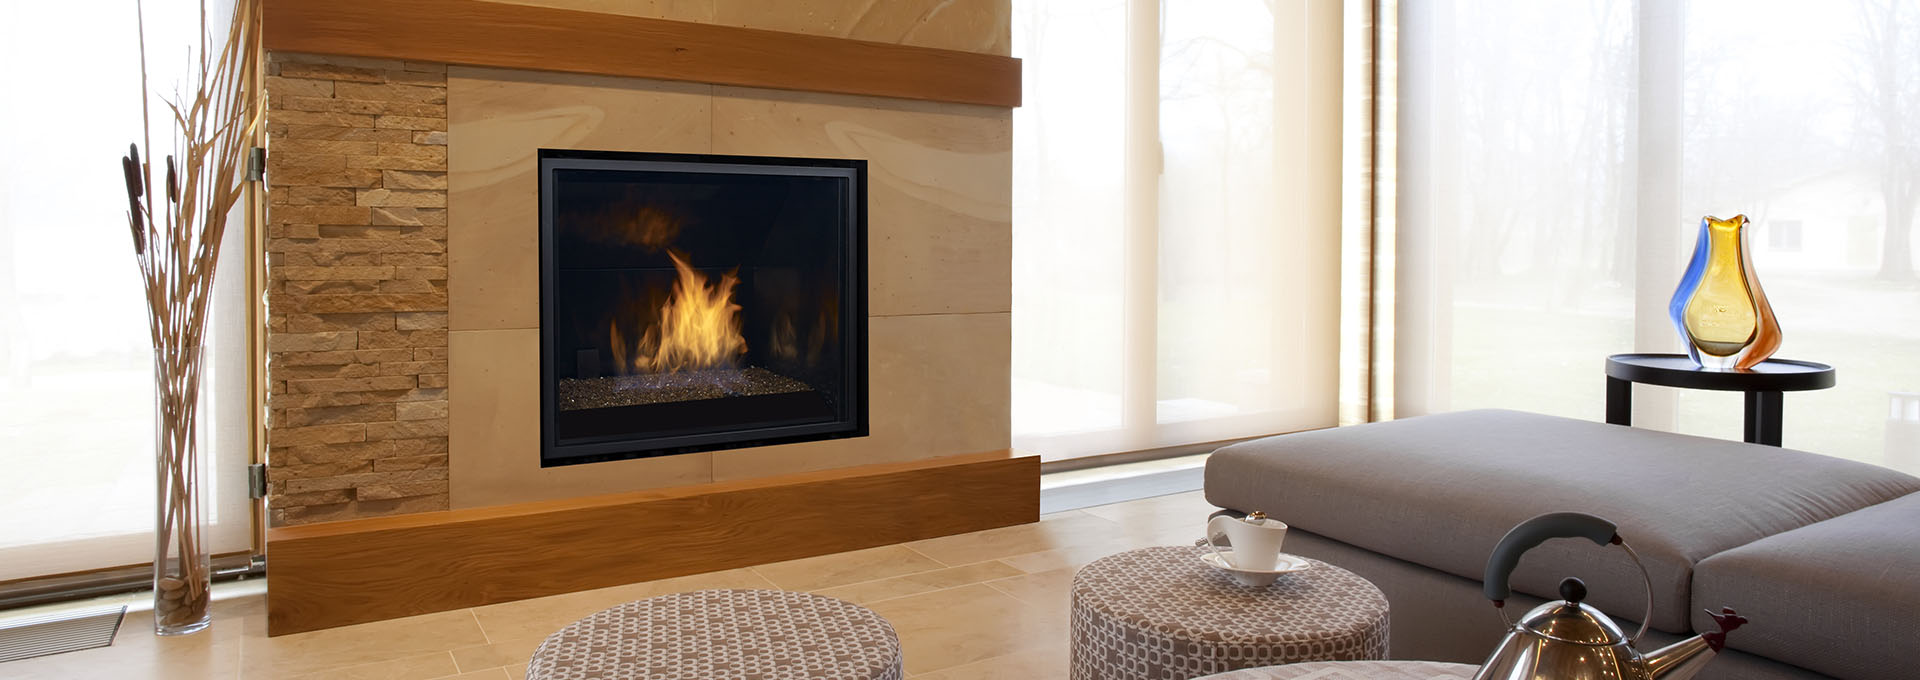 Regency horizon hz965e contemporary gas fireplace for Modern gas fireplace price